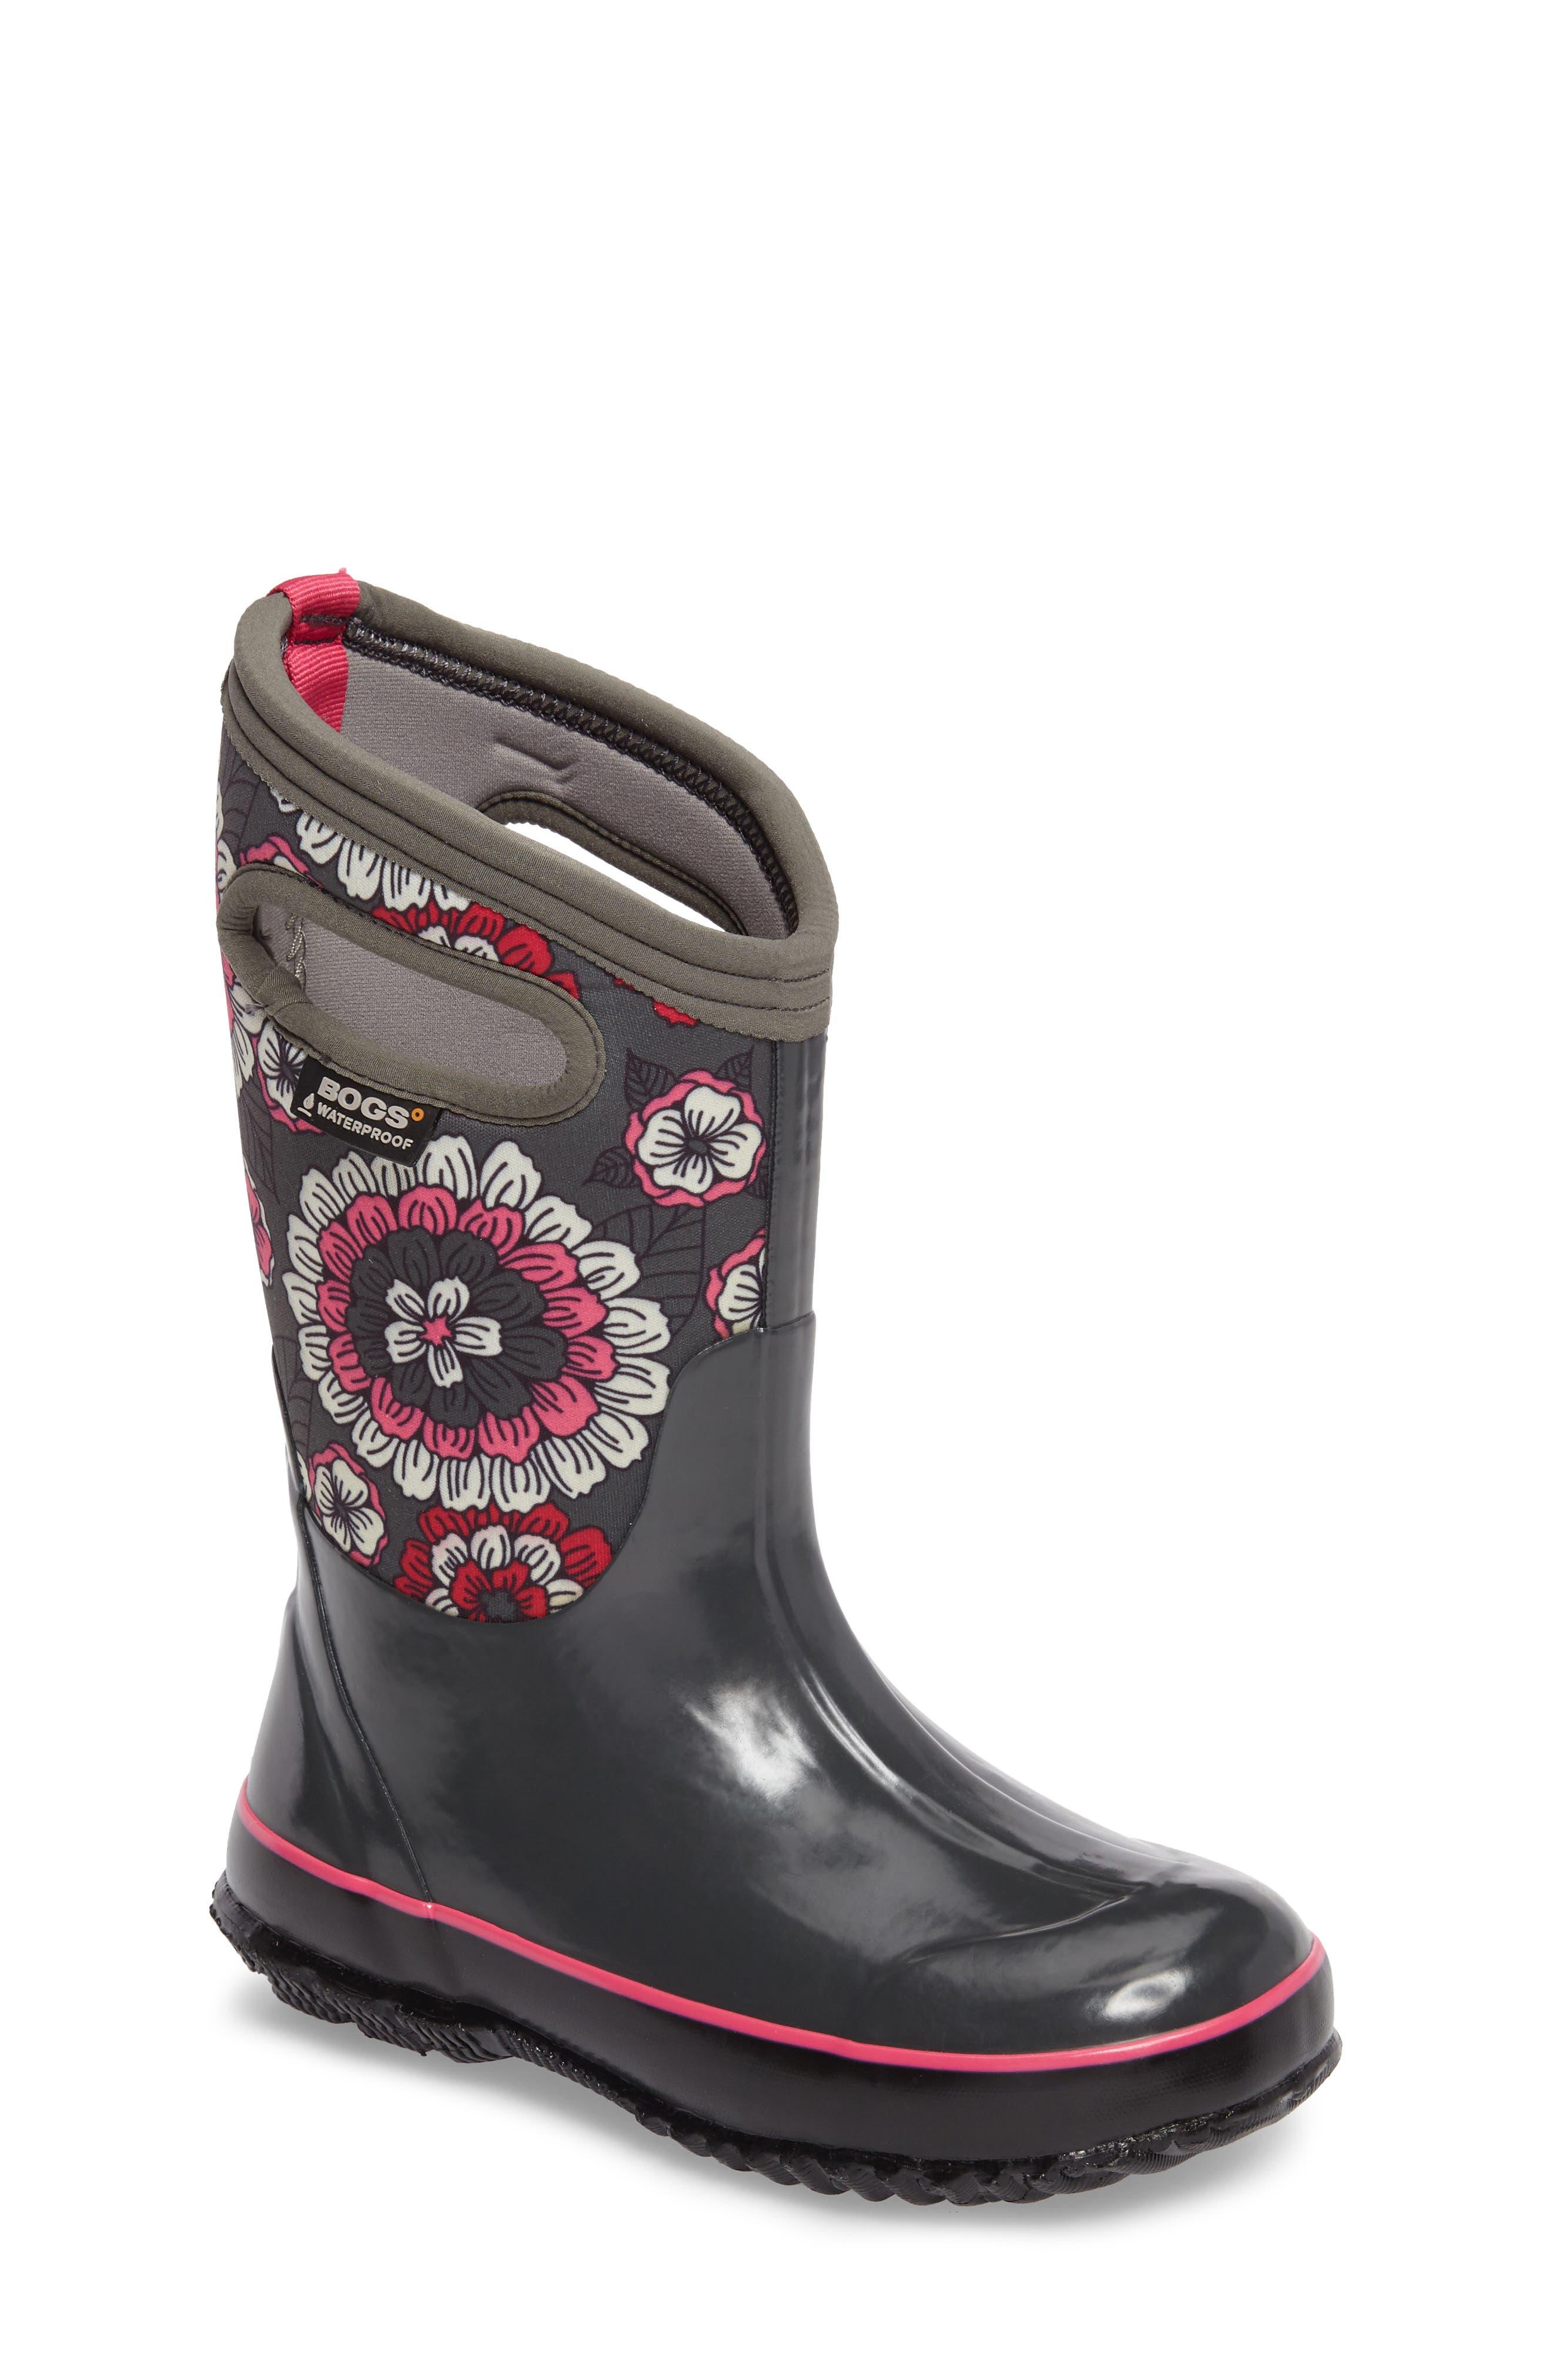 Classic Pansies Insulated Waterproof Boot,                         Main,                         color, DARK GRAY MULTI